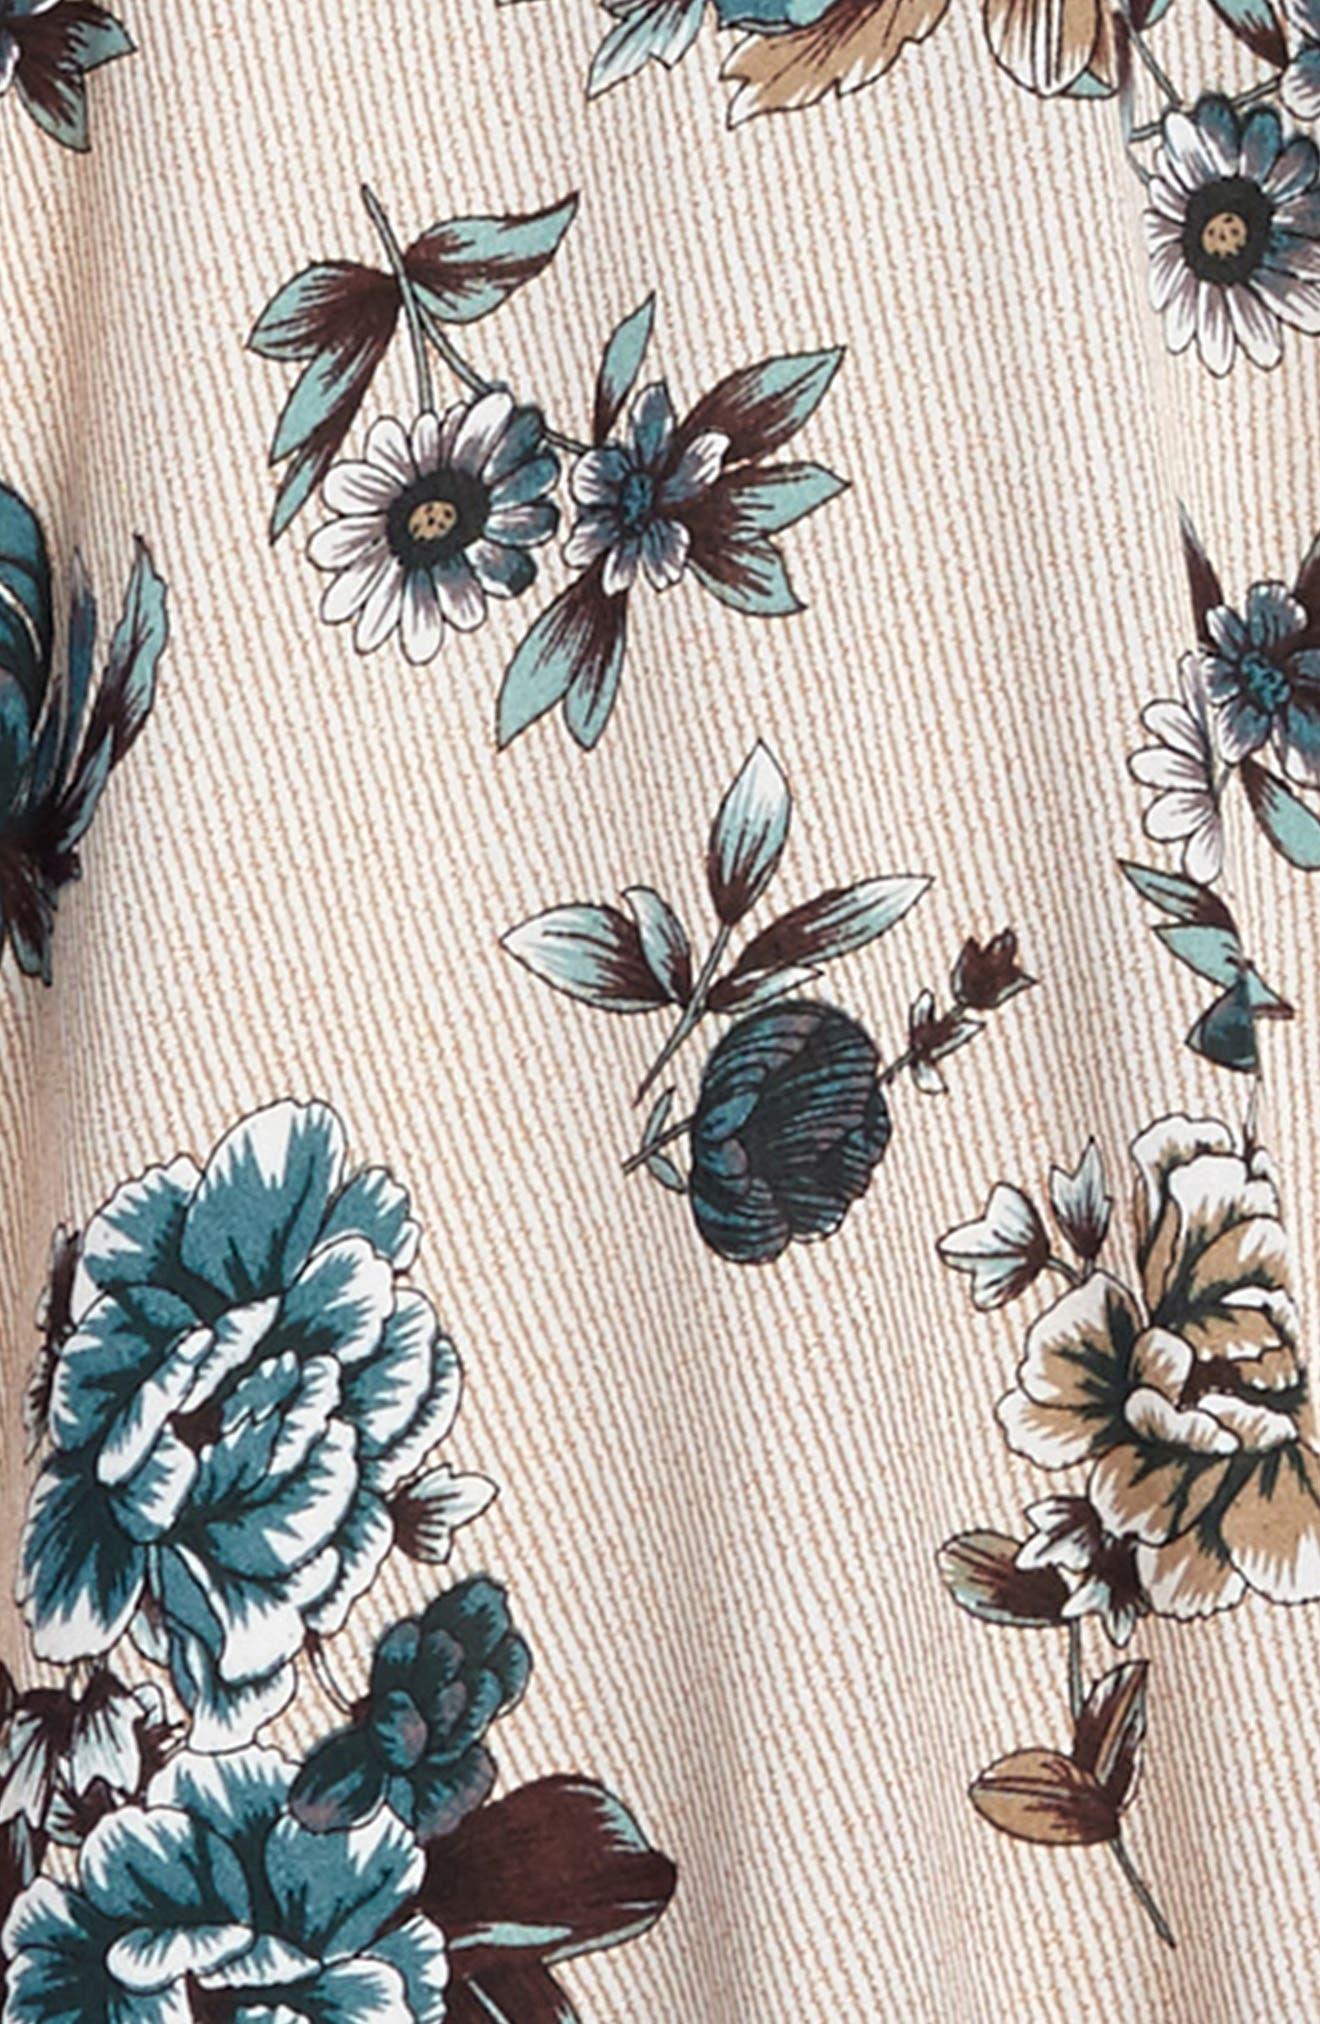 Floral Print Ruffle Sleeve Dress,                             Alternate thumbnail 3, color,                             250